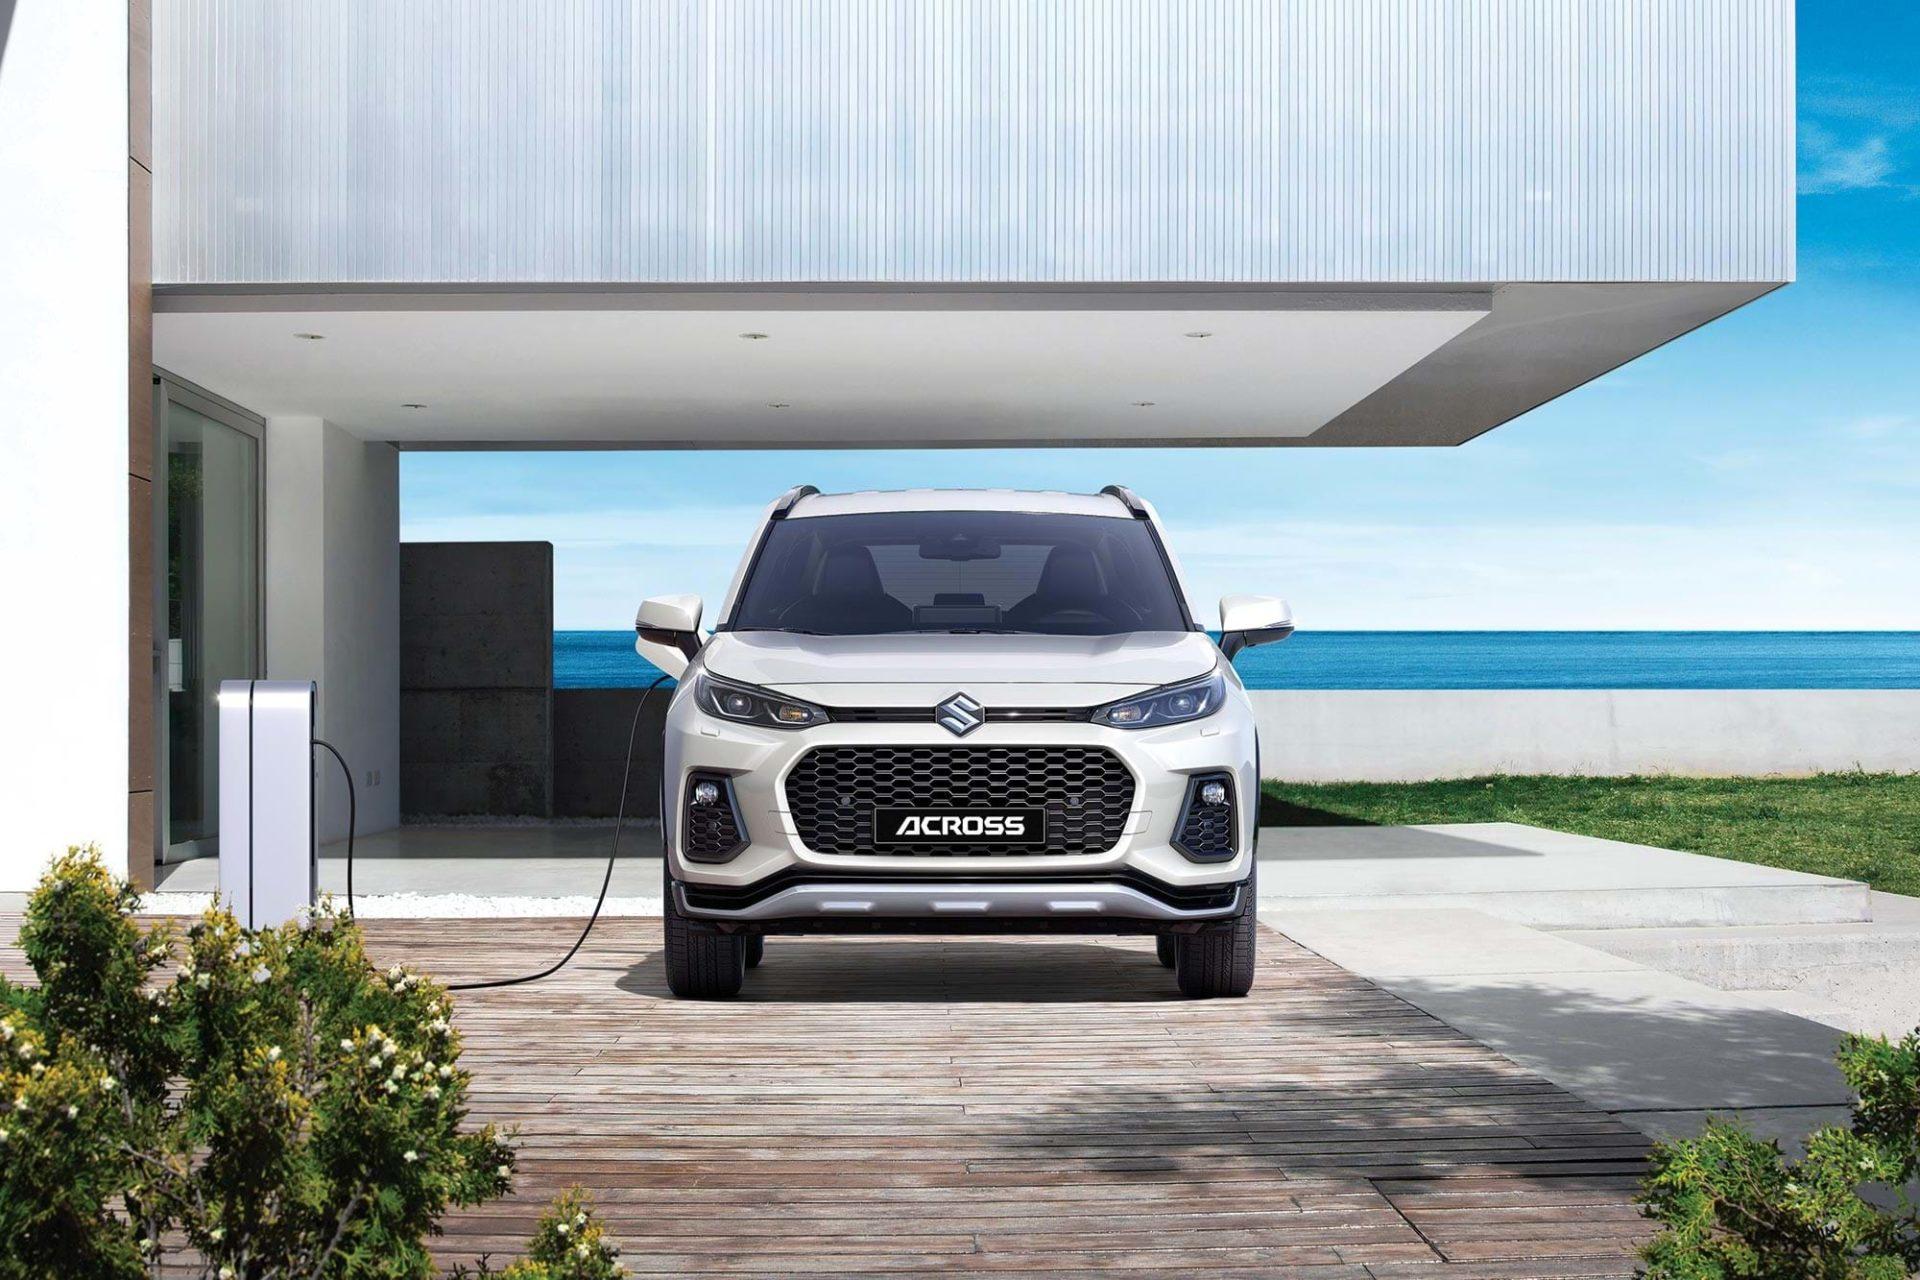 Suzuki ACROSS – new plug-in hybrid showcased by Suzuki